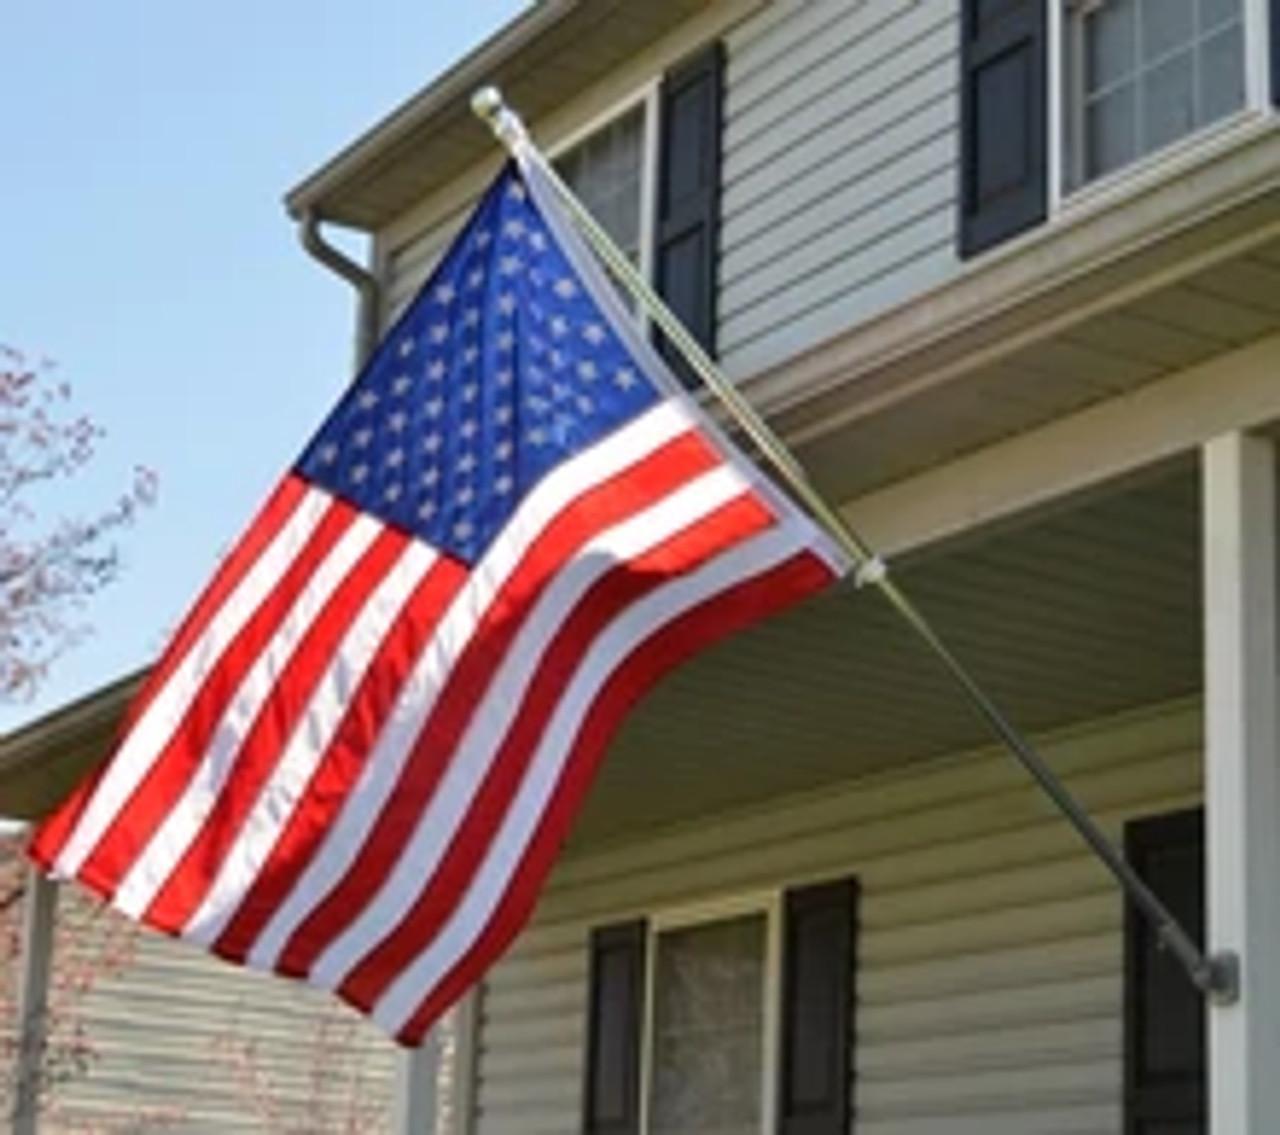 Tangle Free Flag Pole 6ft WHITE